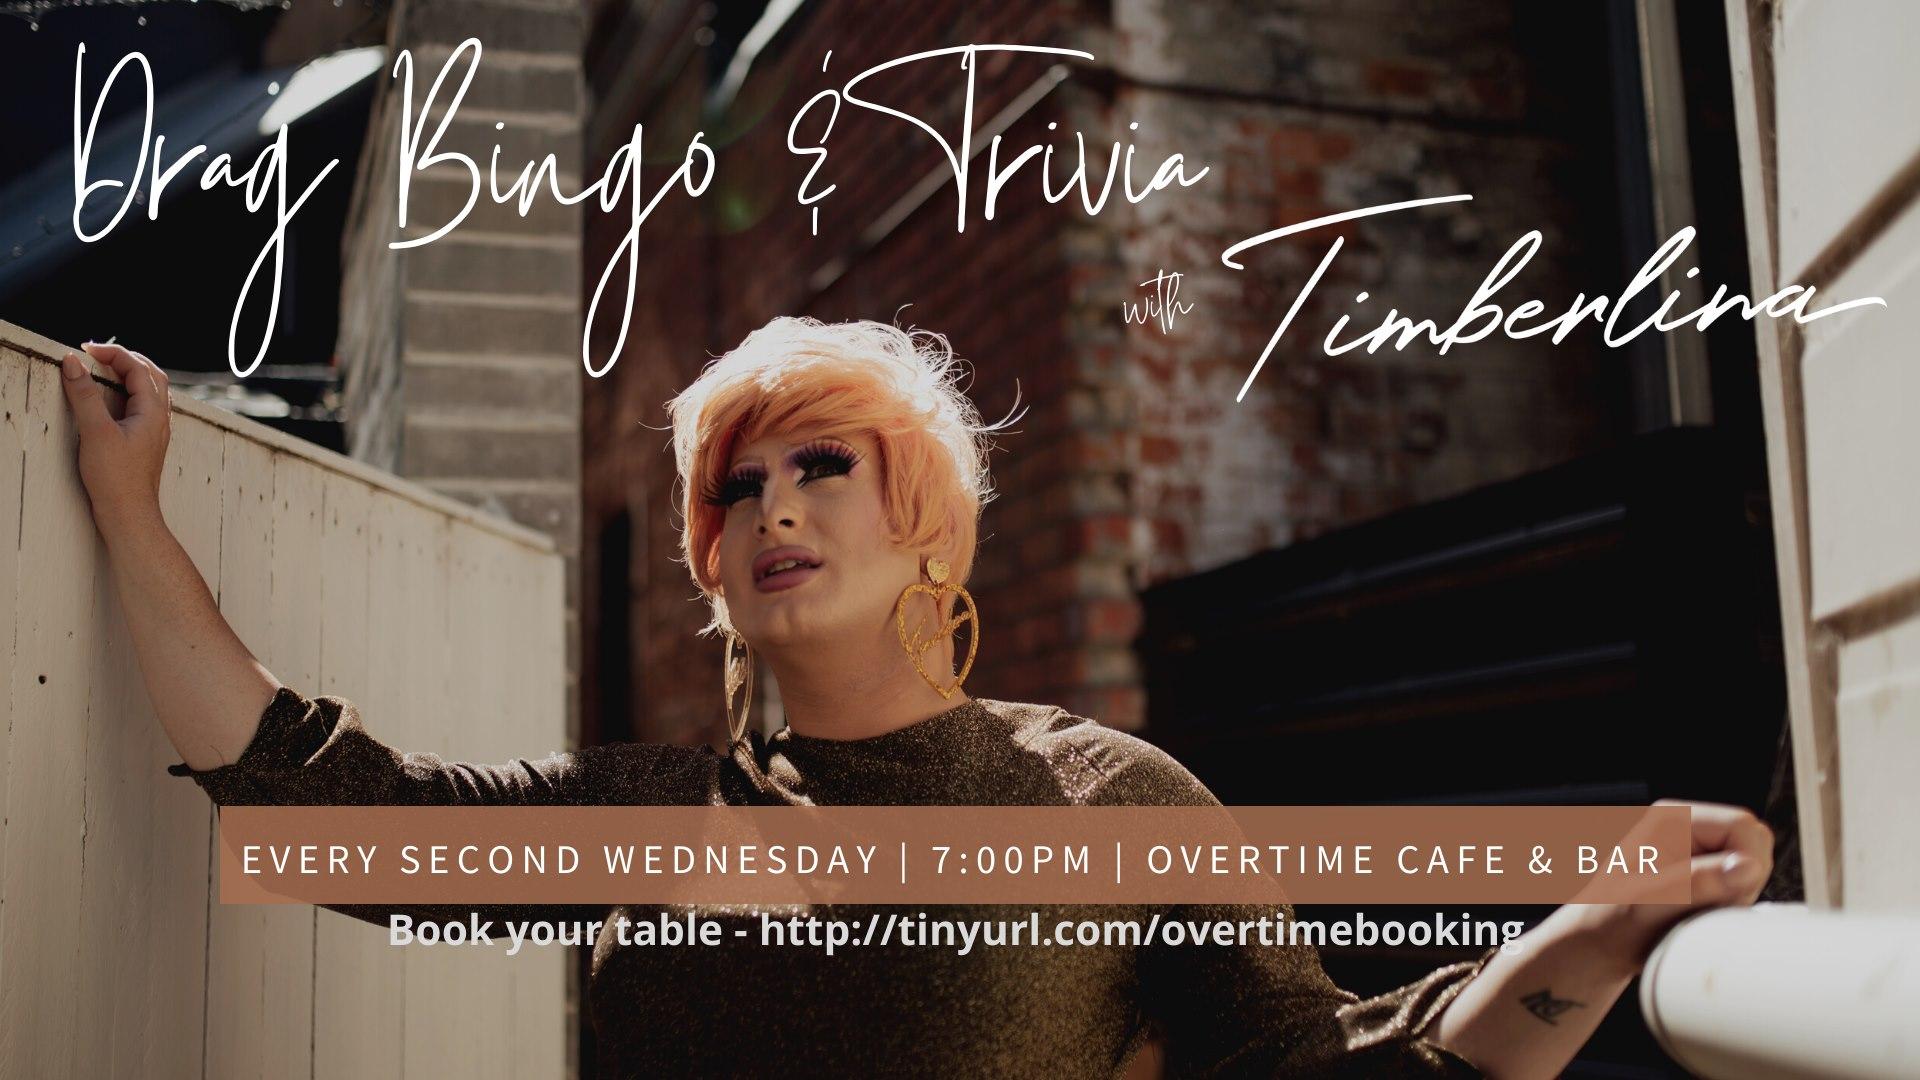 Drag Bingo & Trivia with Timberlina | 7pm | Overtime Cafe & Bar